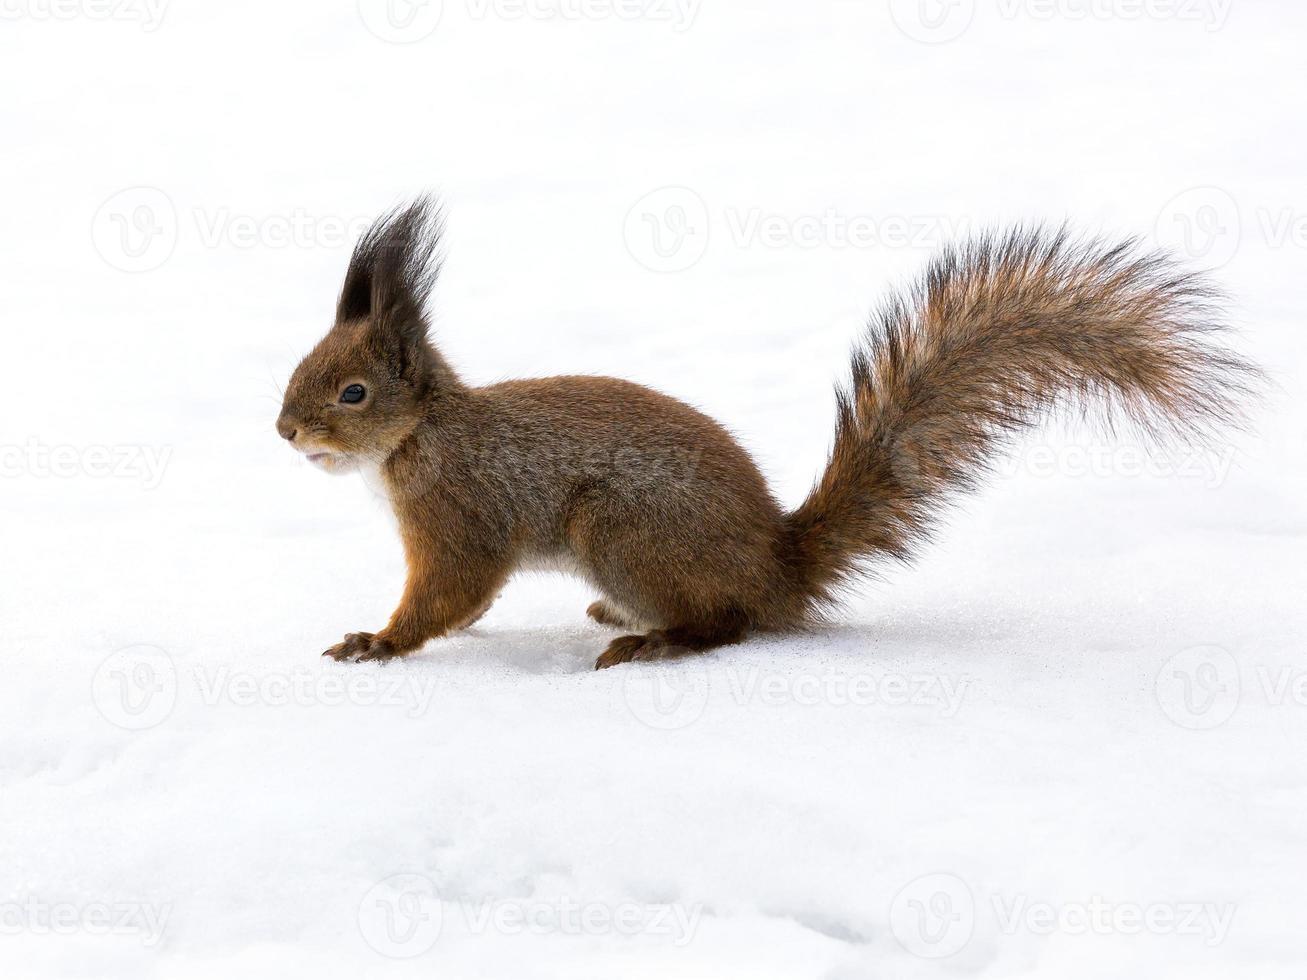 söt röd ekorre på snö foto